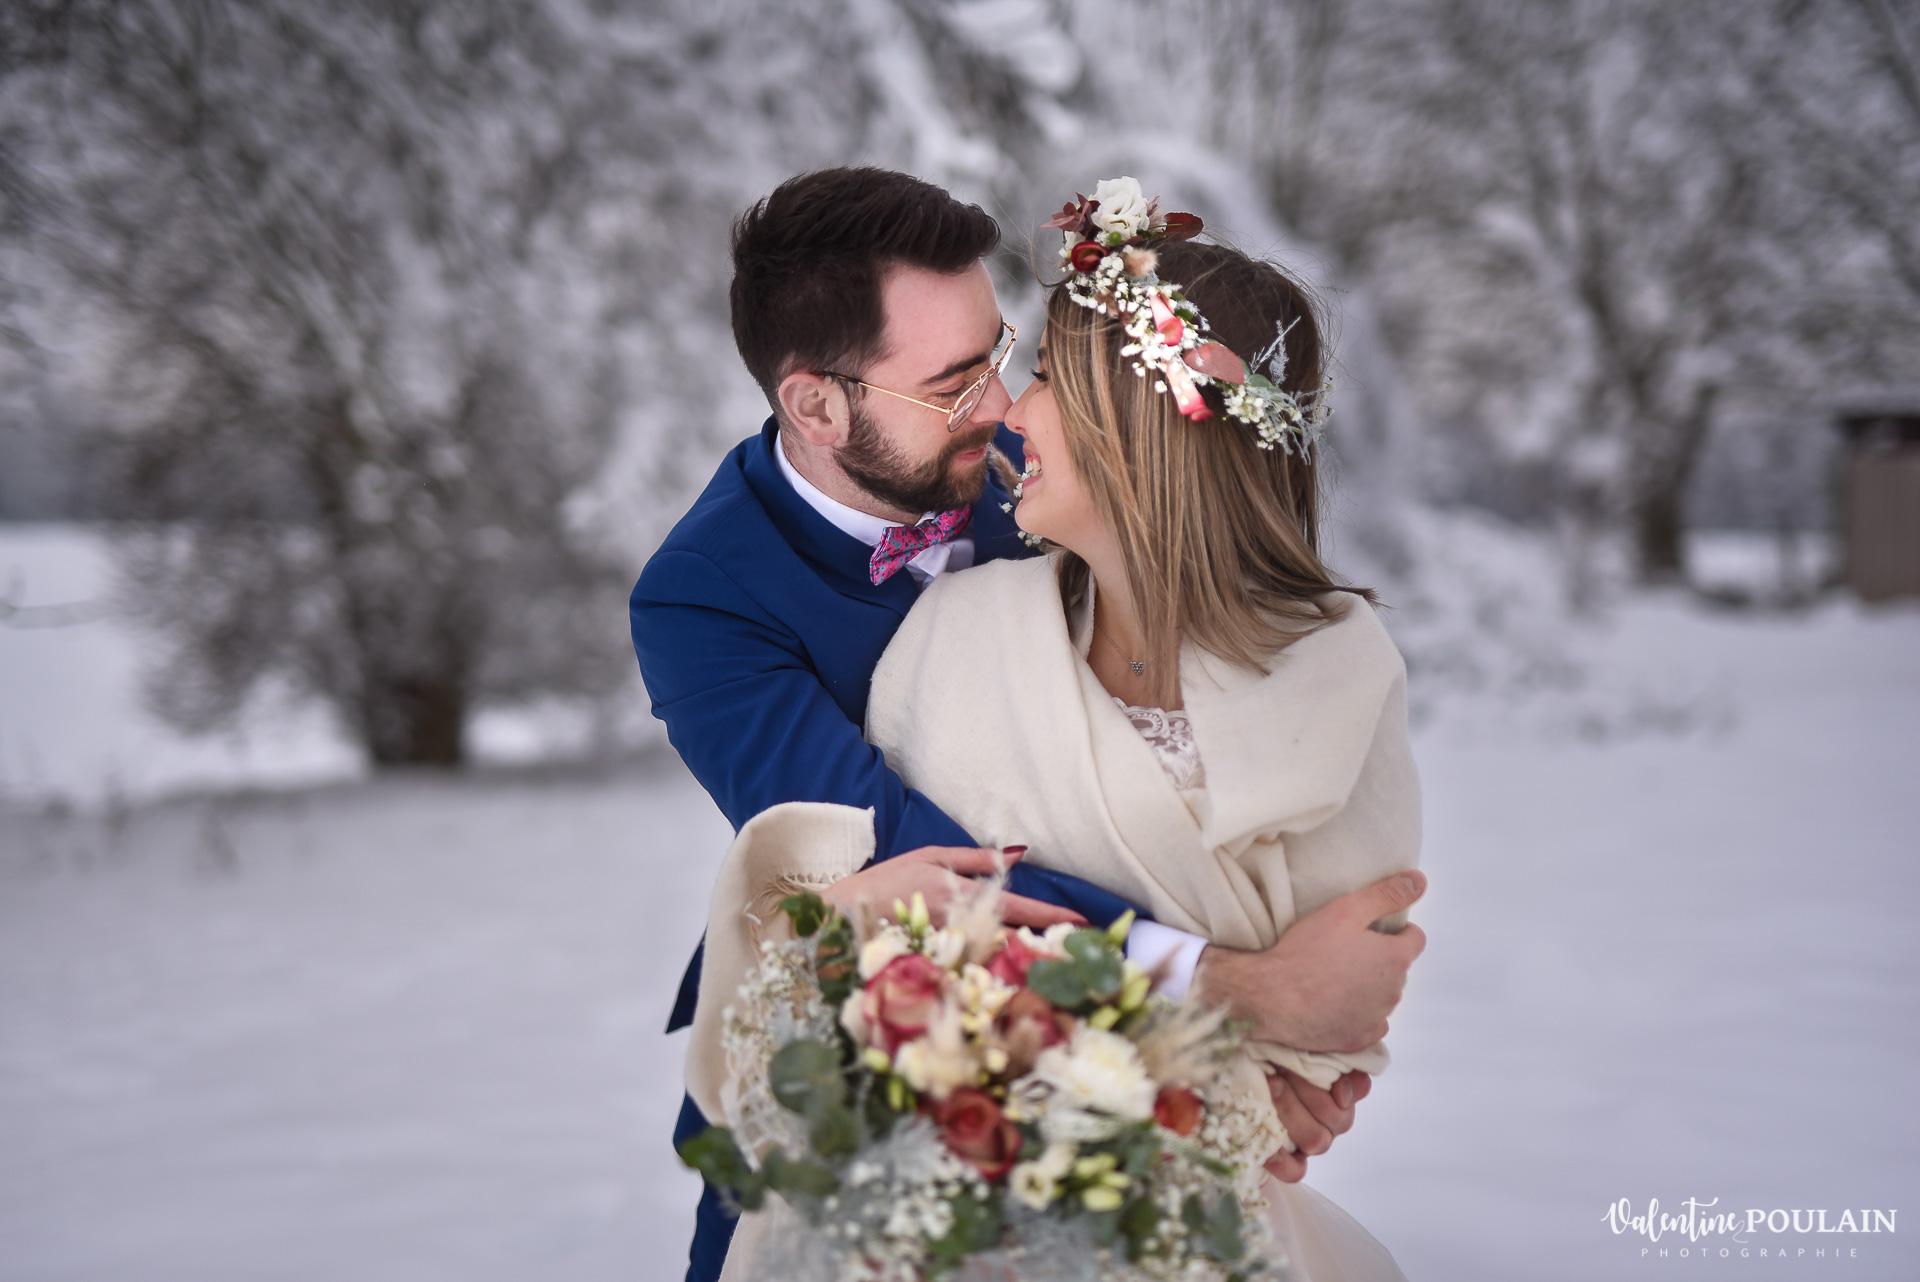 Photo mariage neige hiver - Valentine Poulain couple